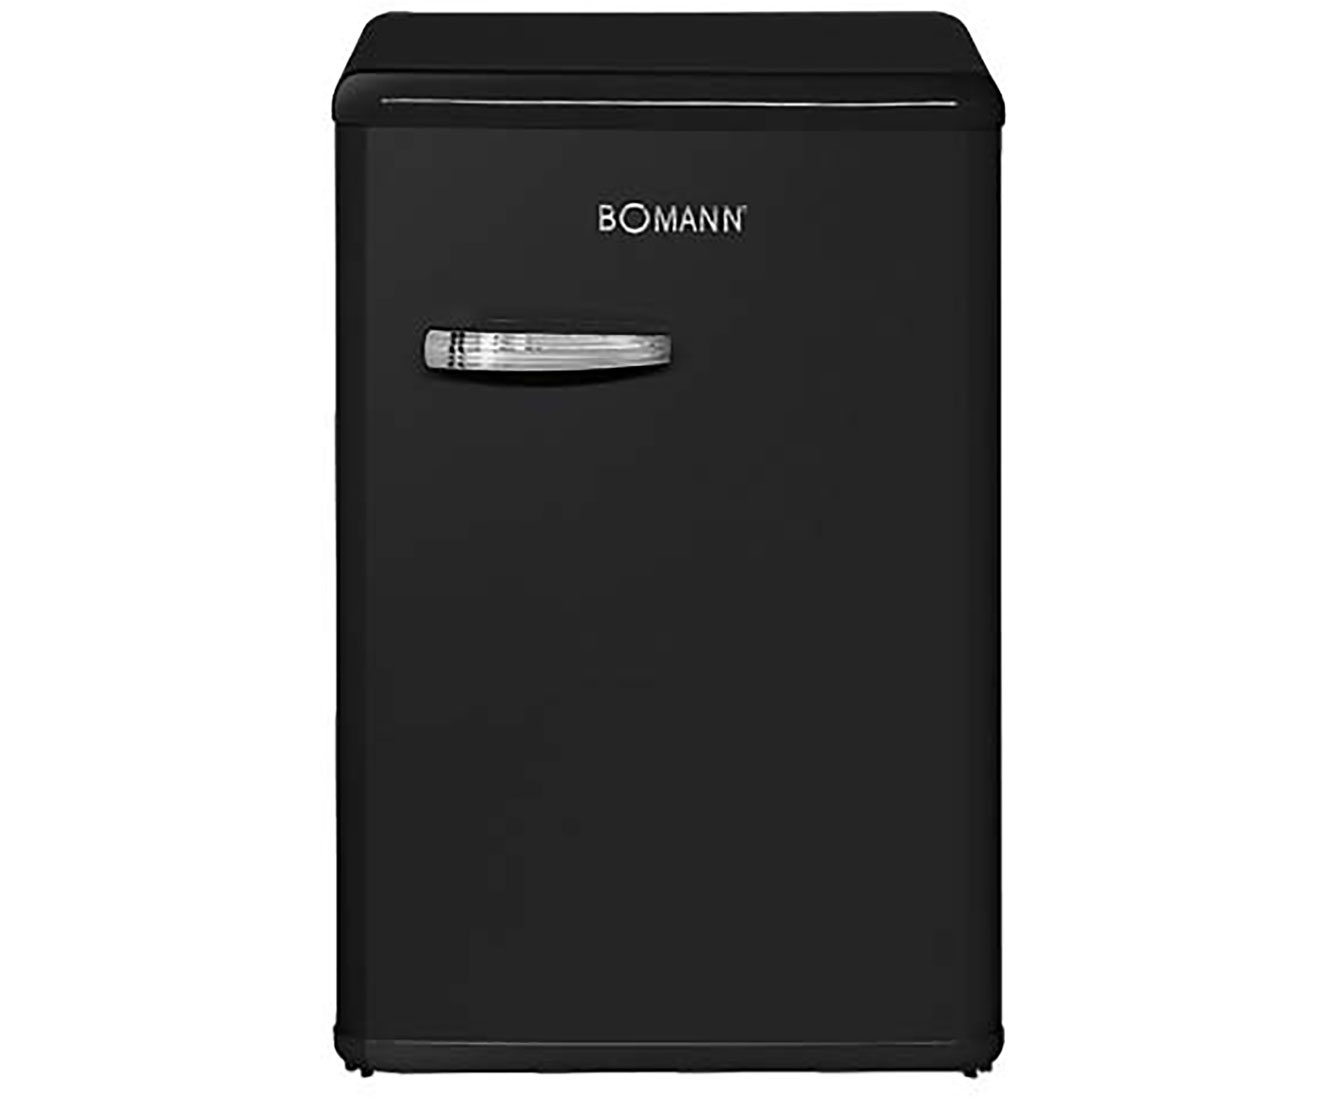 Bomann Kühlschrank Bewertung : Bomann vsr kühlschrank schwarz a